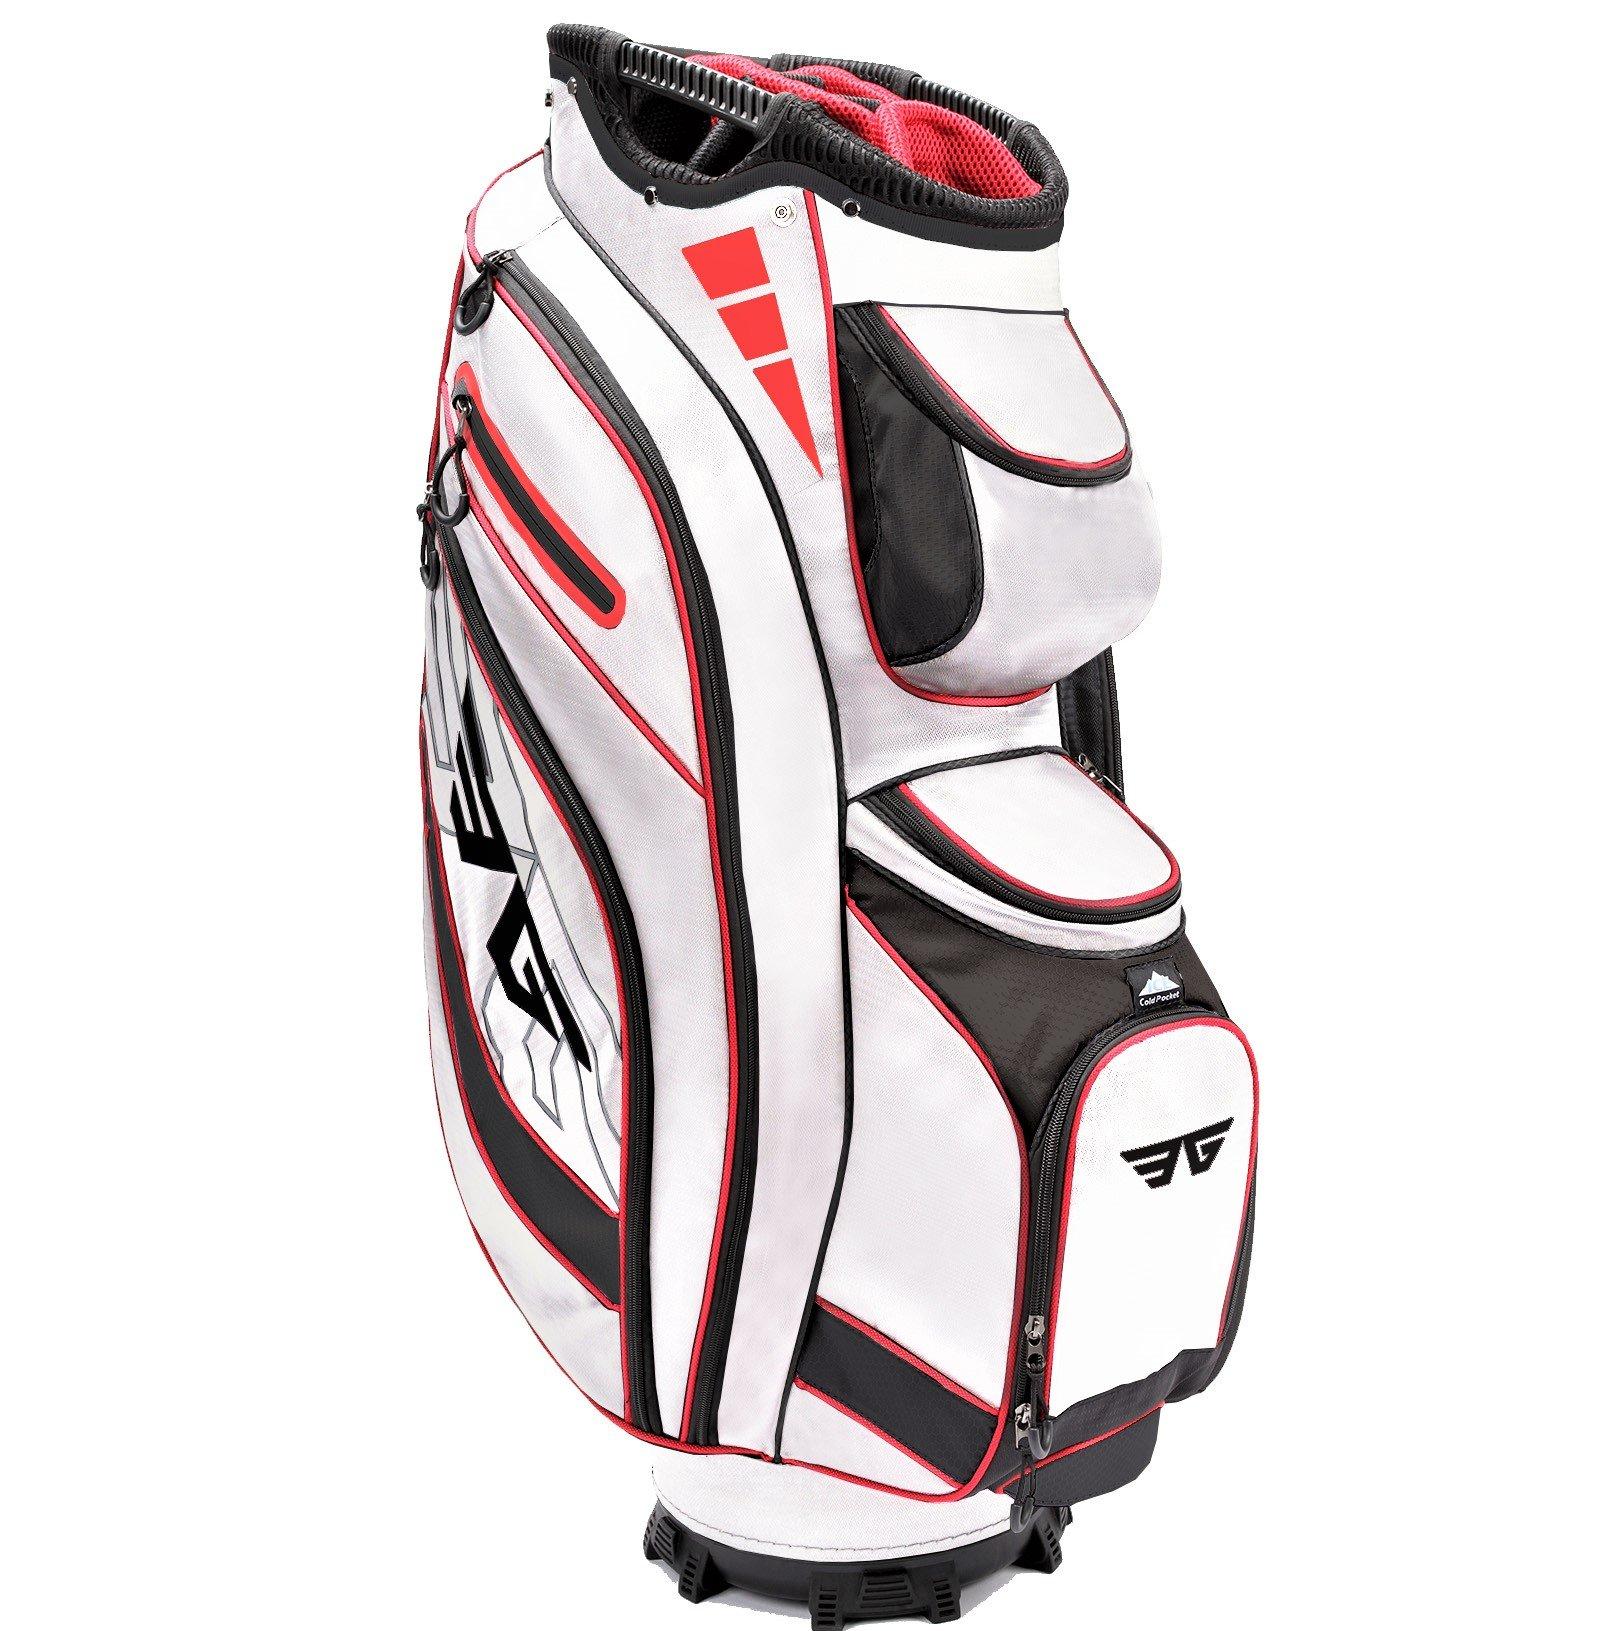 Eagole Super Light Golf Cart Bag,14 Way Top and Full Length Divider,10 Pockets (White) by EG EAGOLE